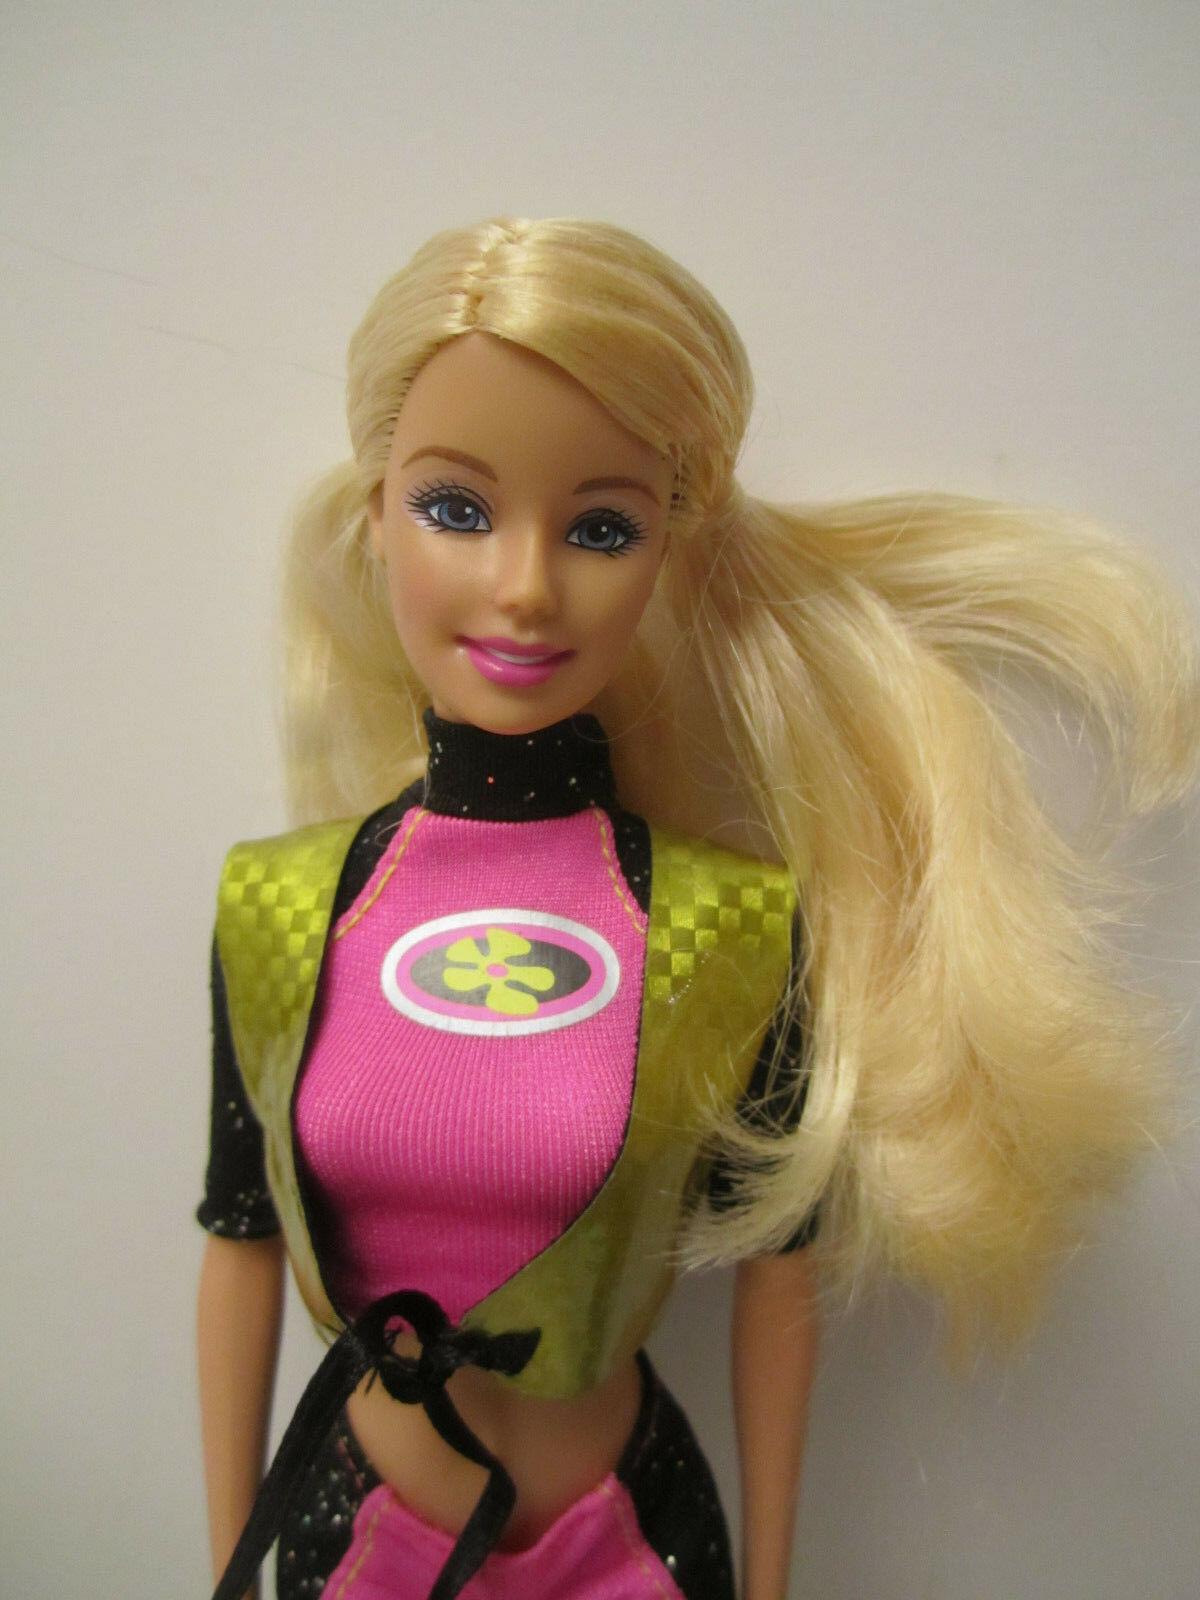 MINT Deboxed Partial 2003 Barbie Sea Splashin' Set Doll with Jetski & Dolphin image 4